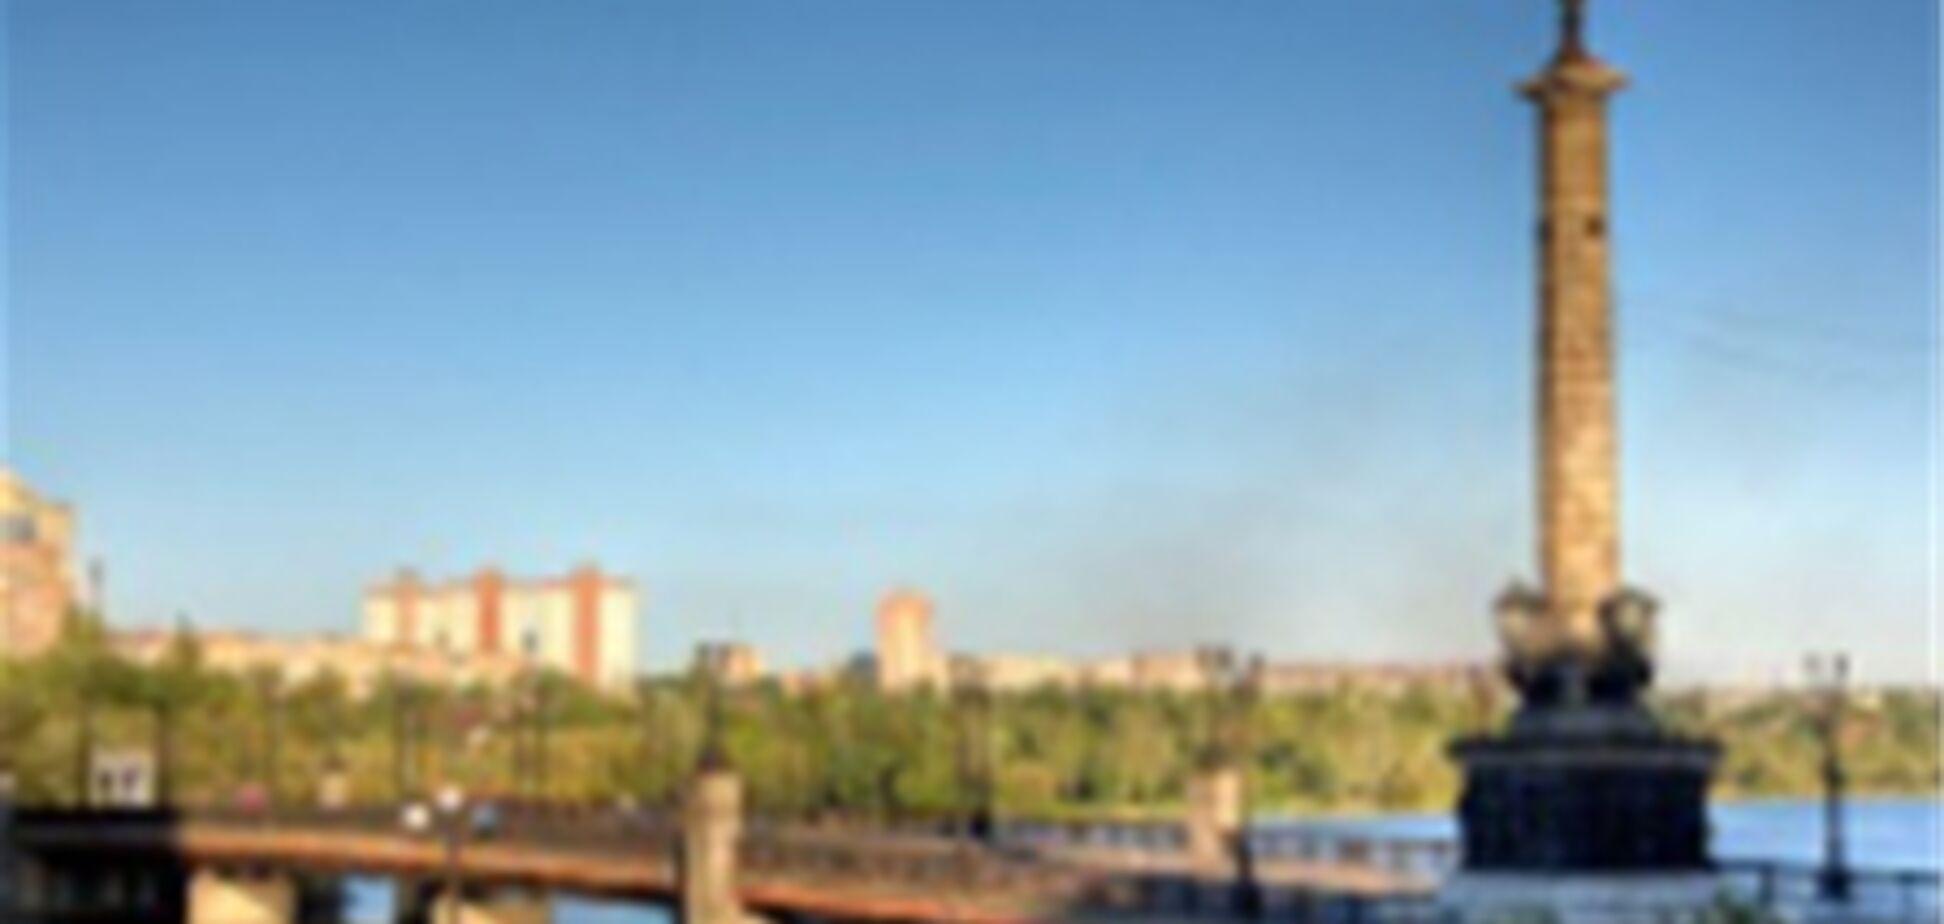 В Донецке отремонтируют набережную за 12 млн грн